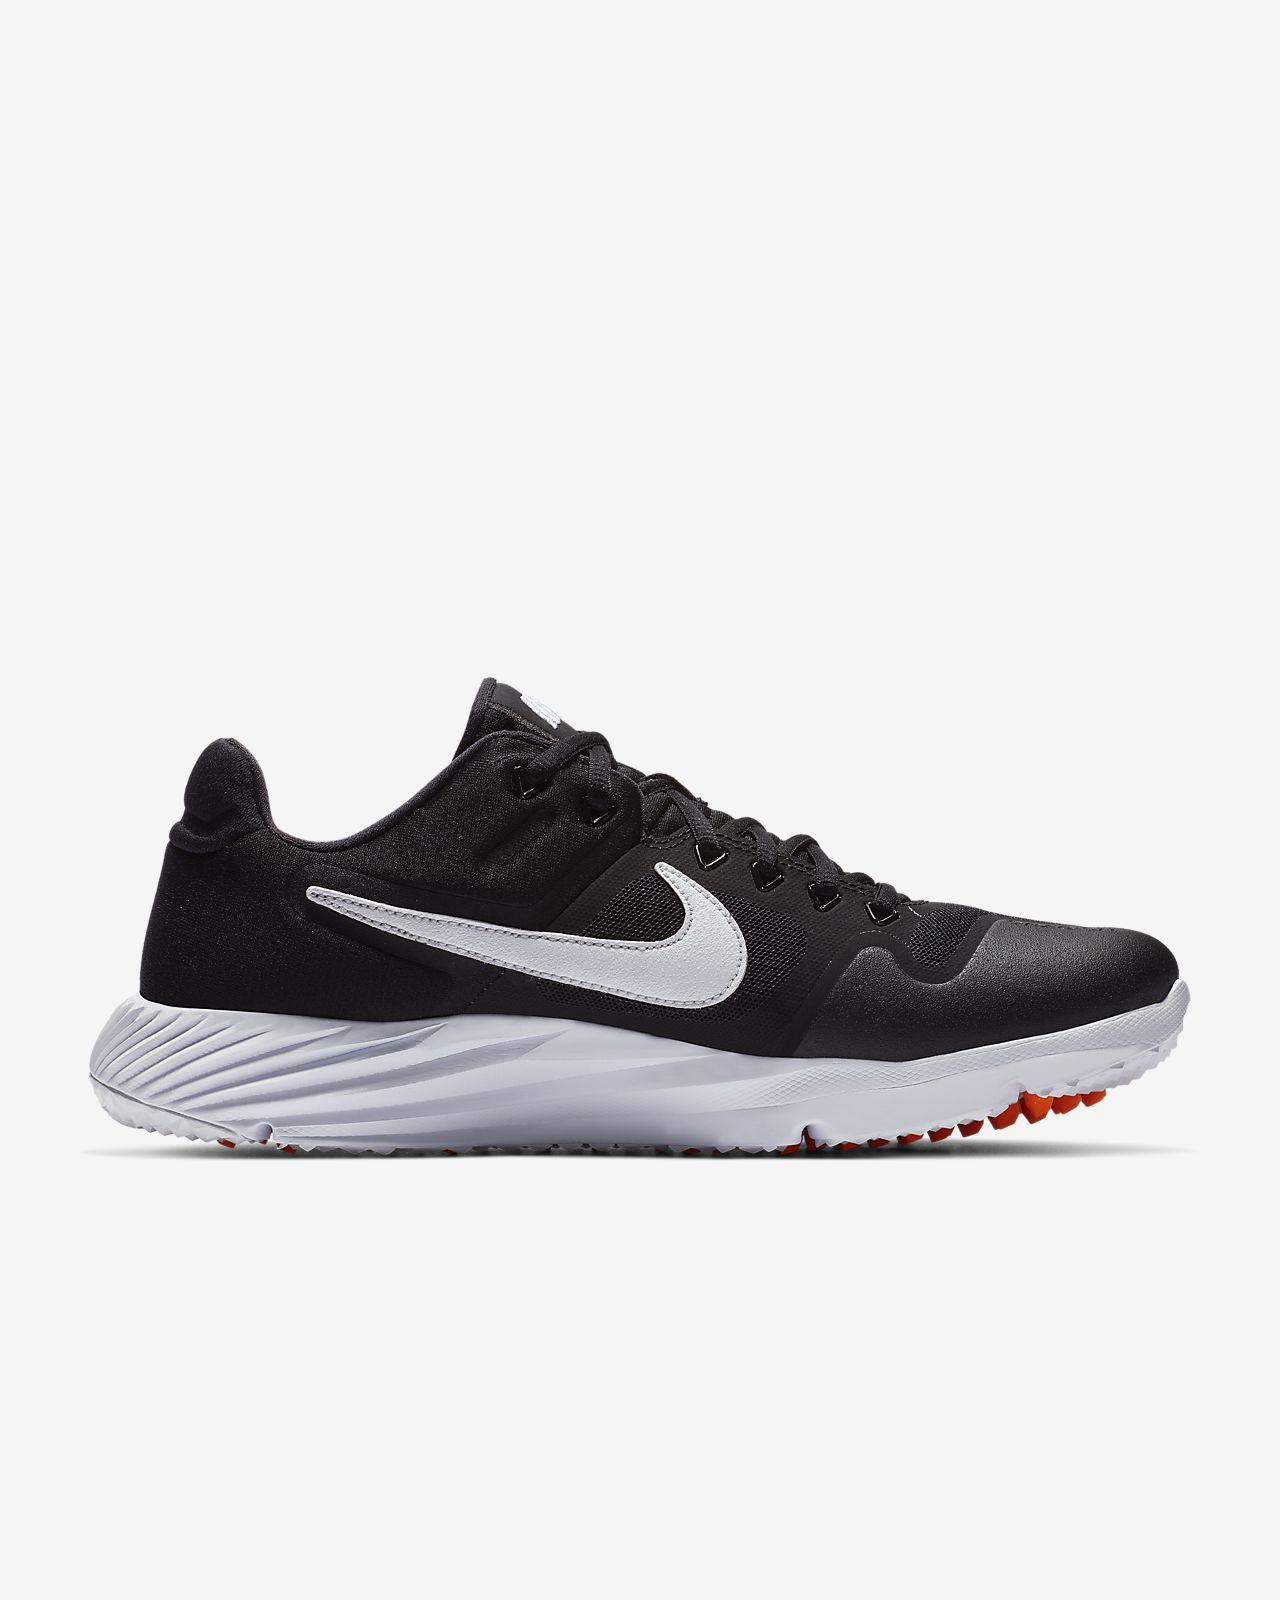 ff53d1bb78f13 Nike Alpha Huarache Elite 2 Turf Baseball Cleat. Nike.com